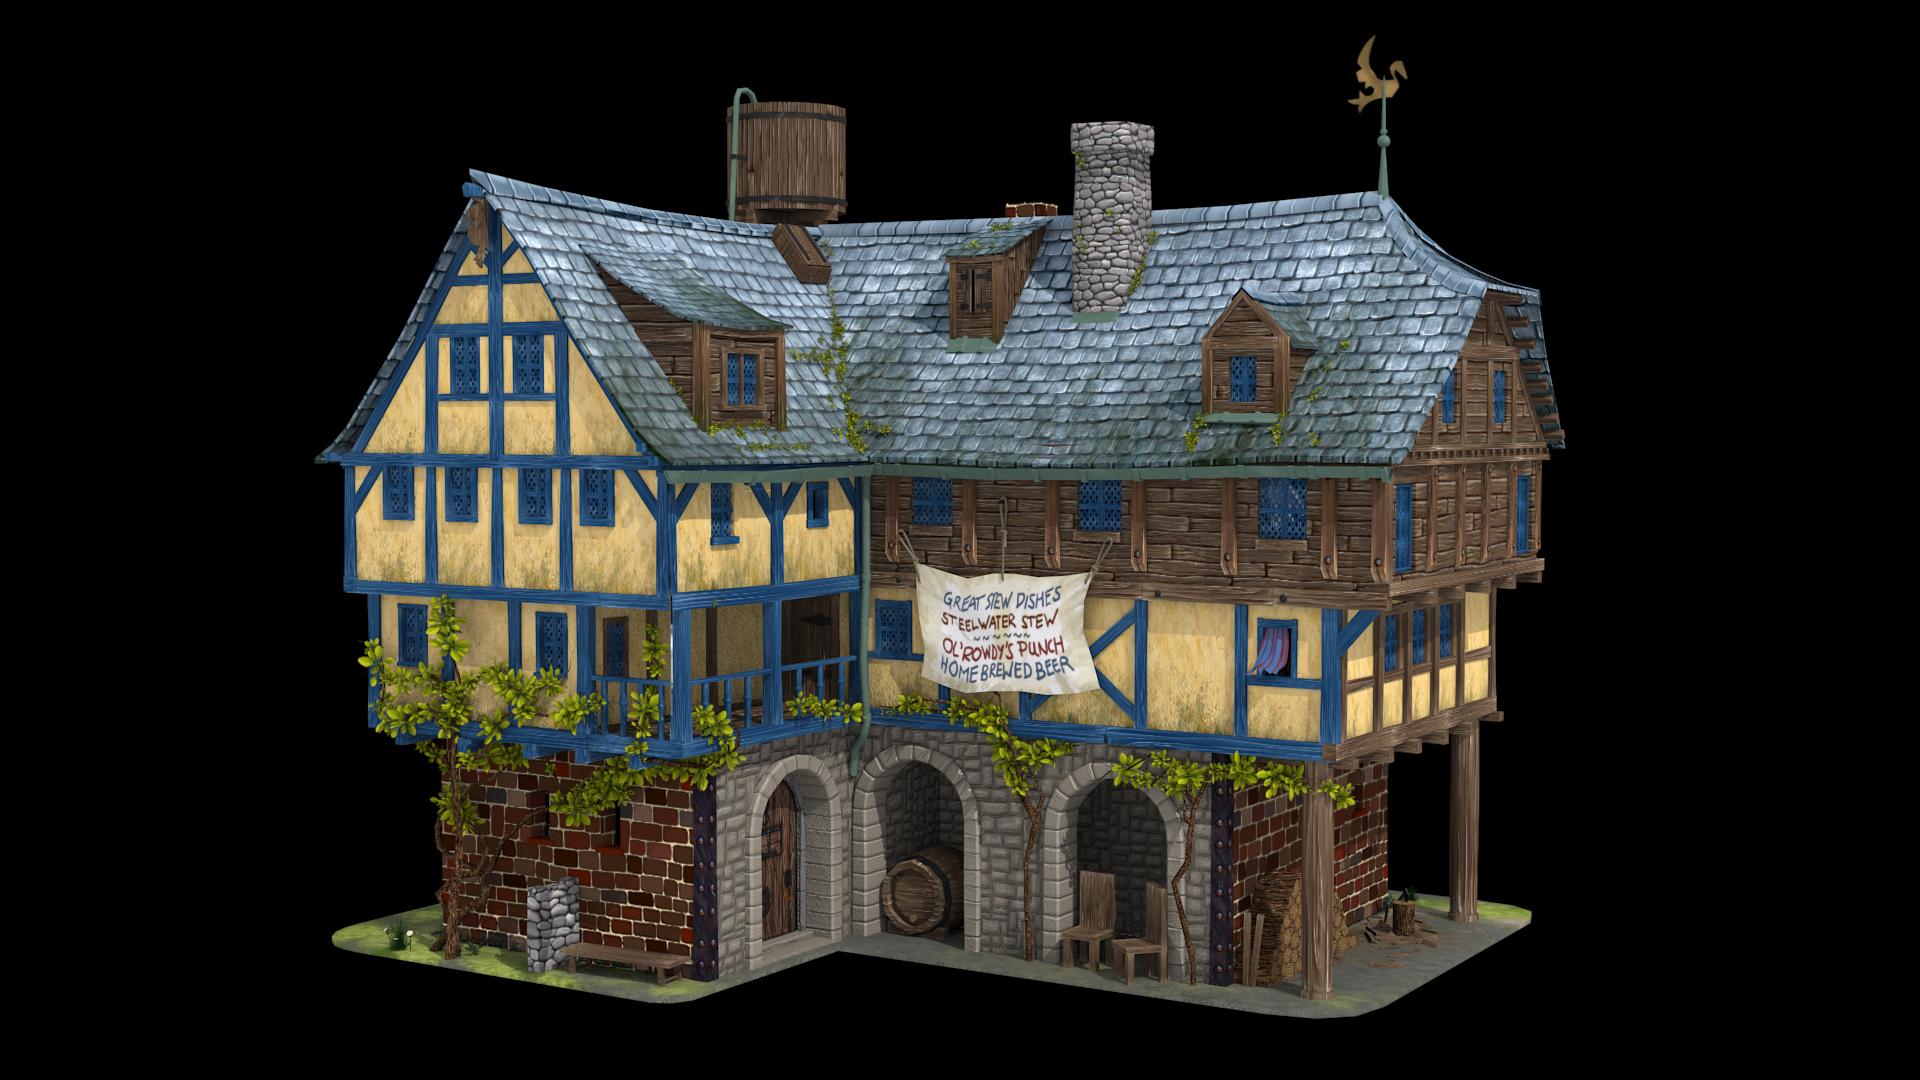 Ol' Rowdys Inn by BoChicoine